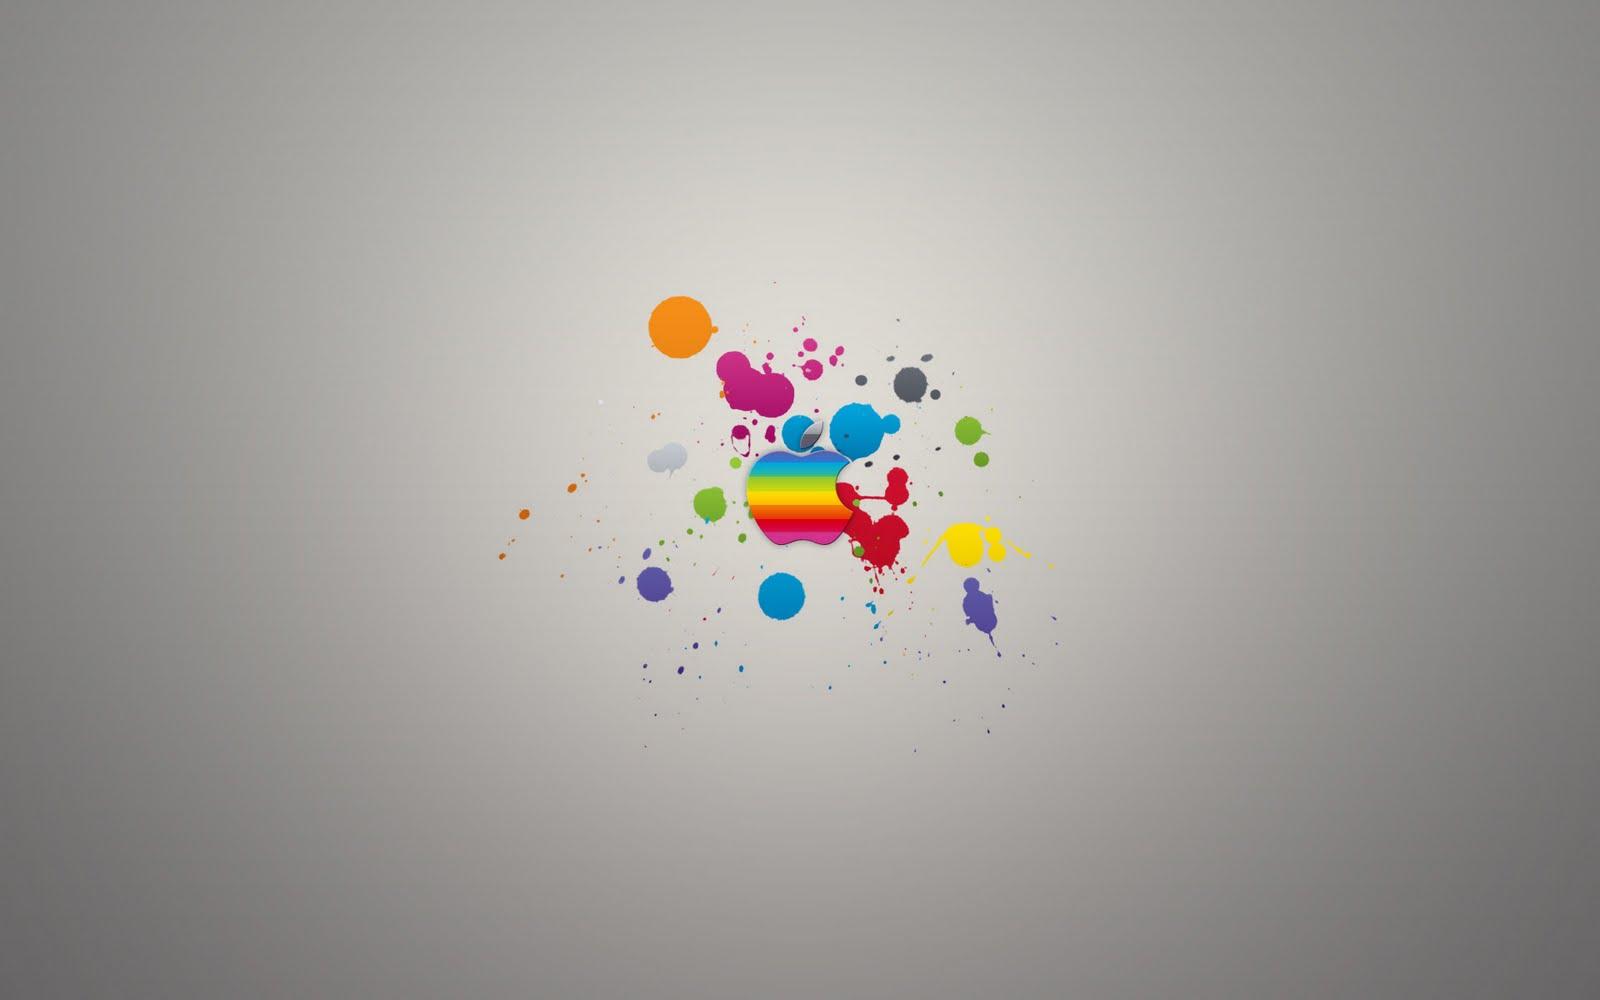 Best Wallpaper App For Iphone خلفيات مدونة ماك